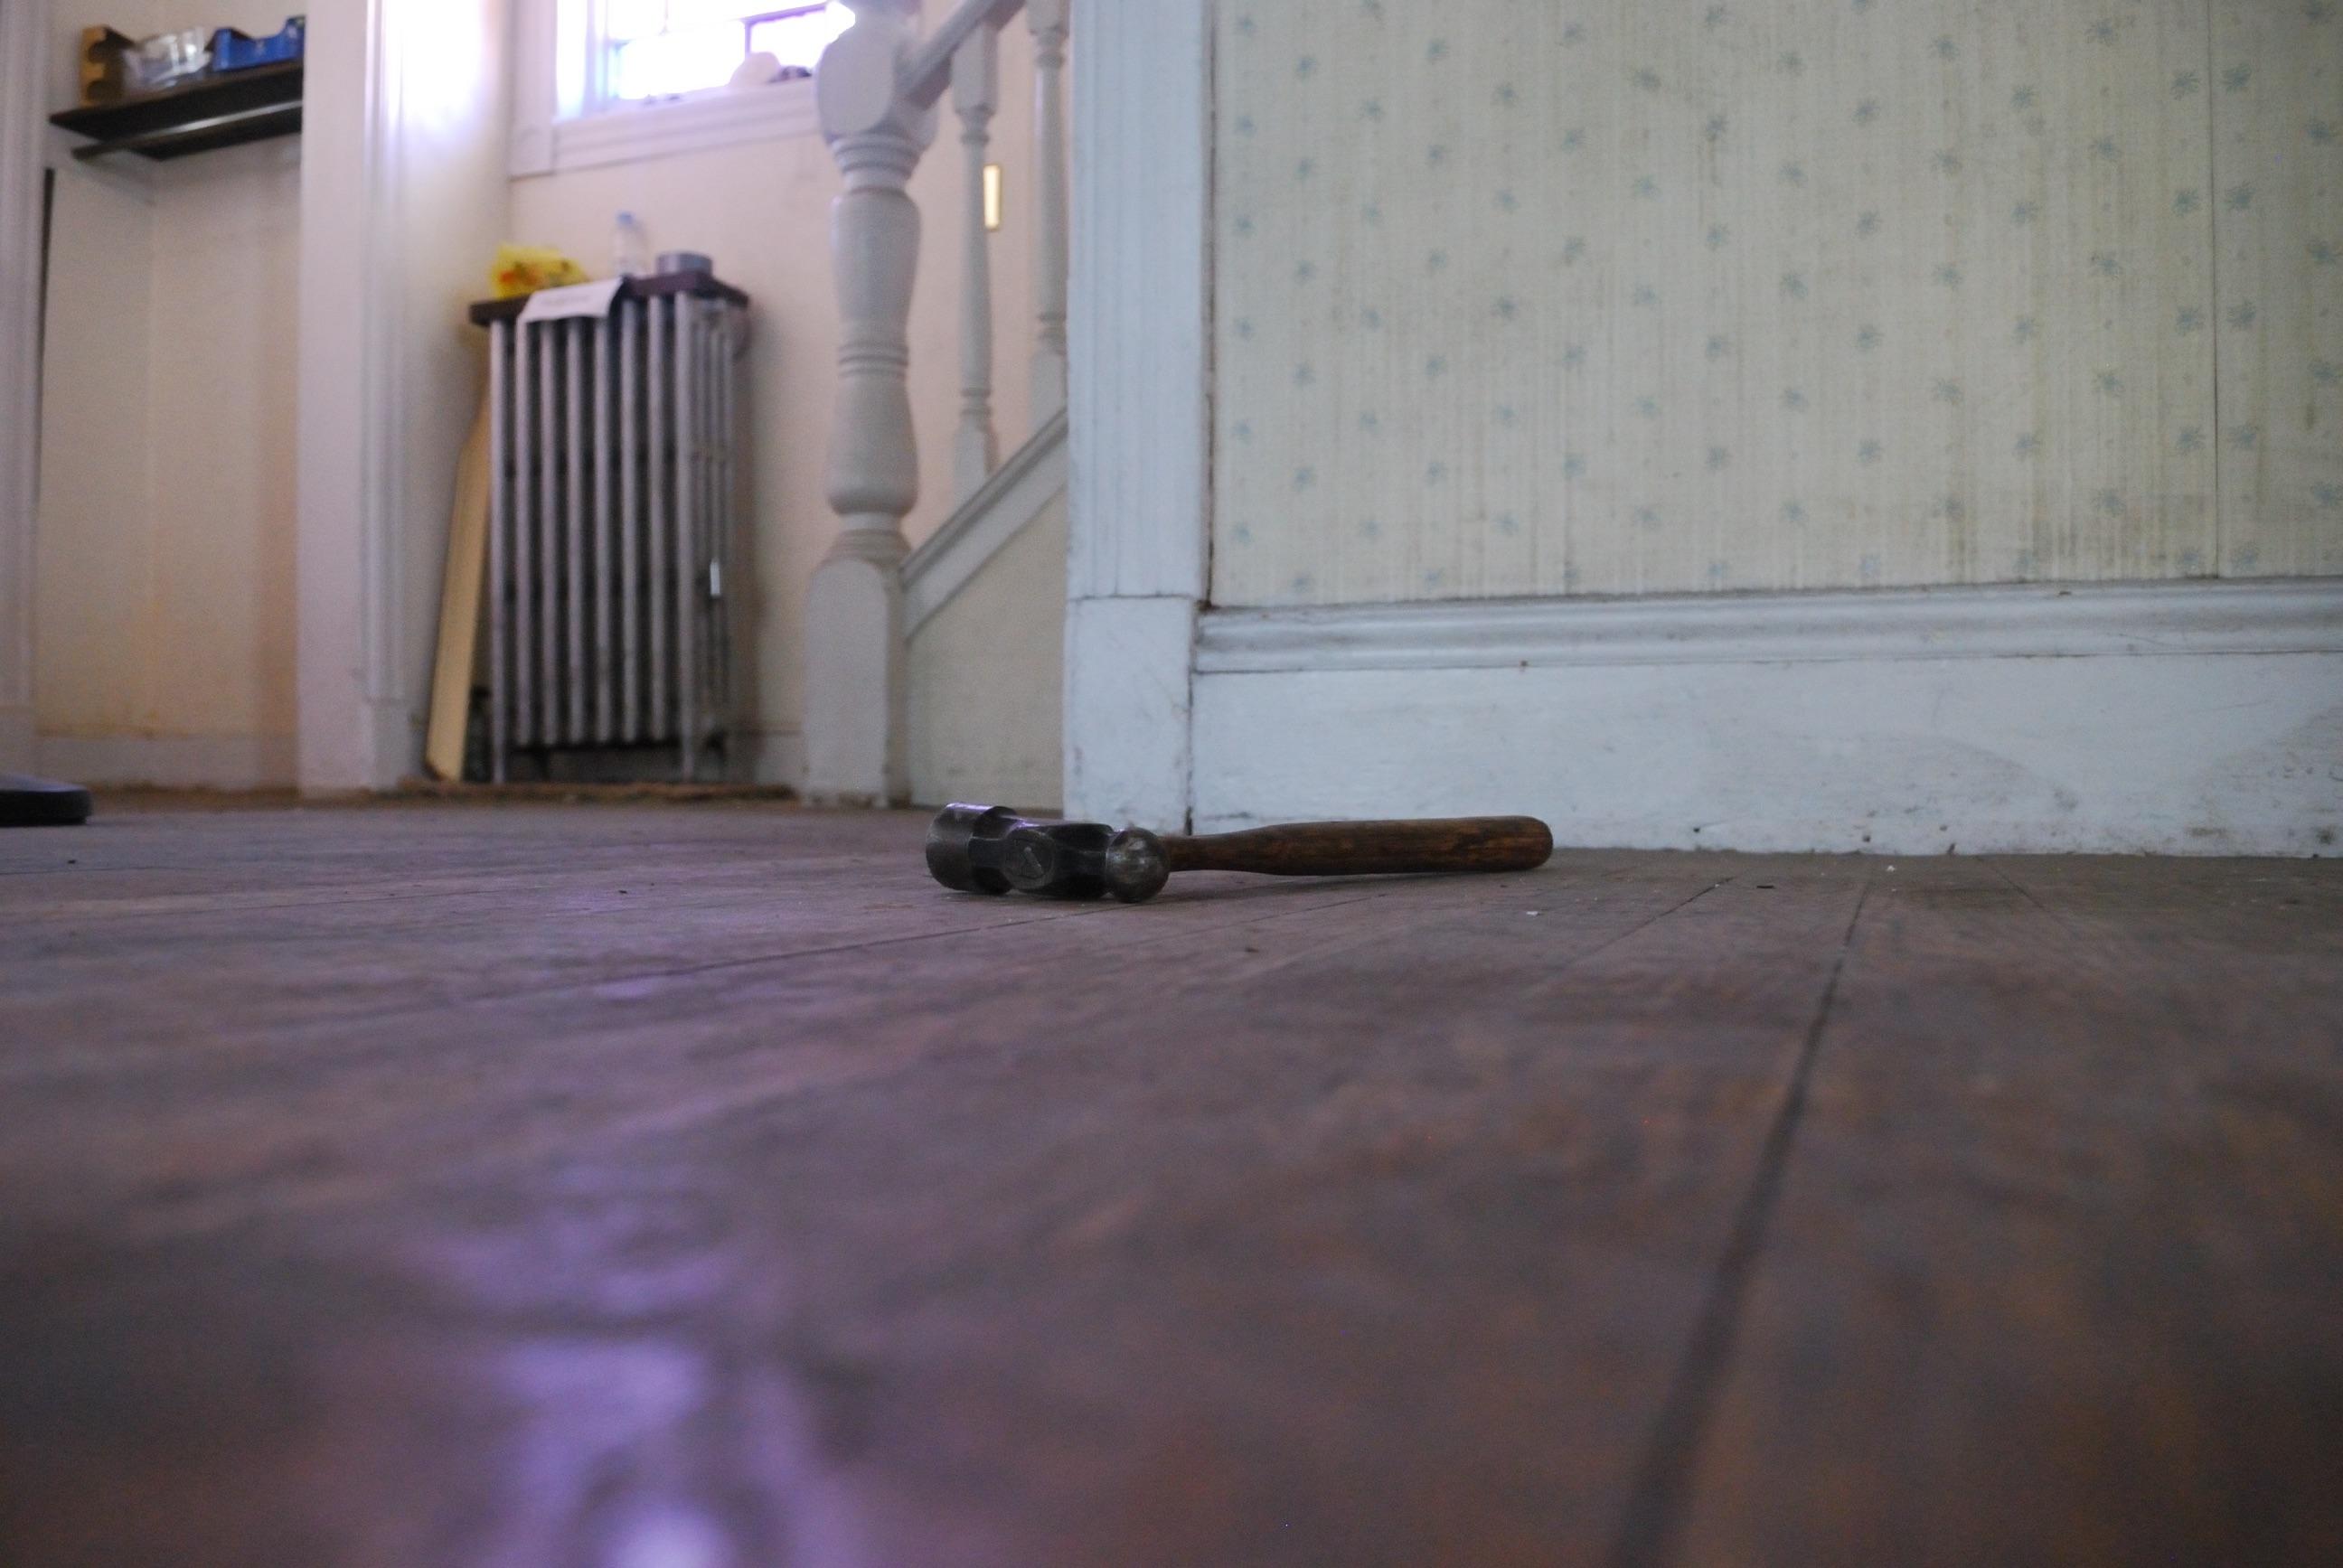 holz stock eigentum fliese zimmer hartholz bodenbelag holzboden laminatboden - Hartholz Oder Laminatboden